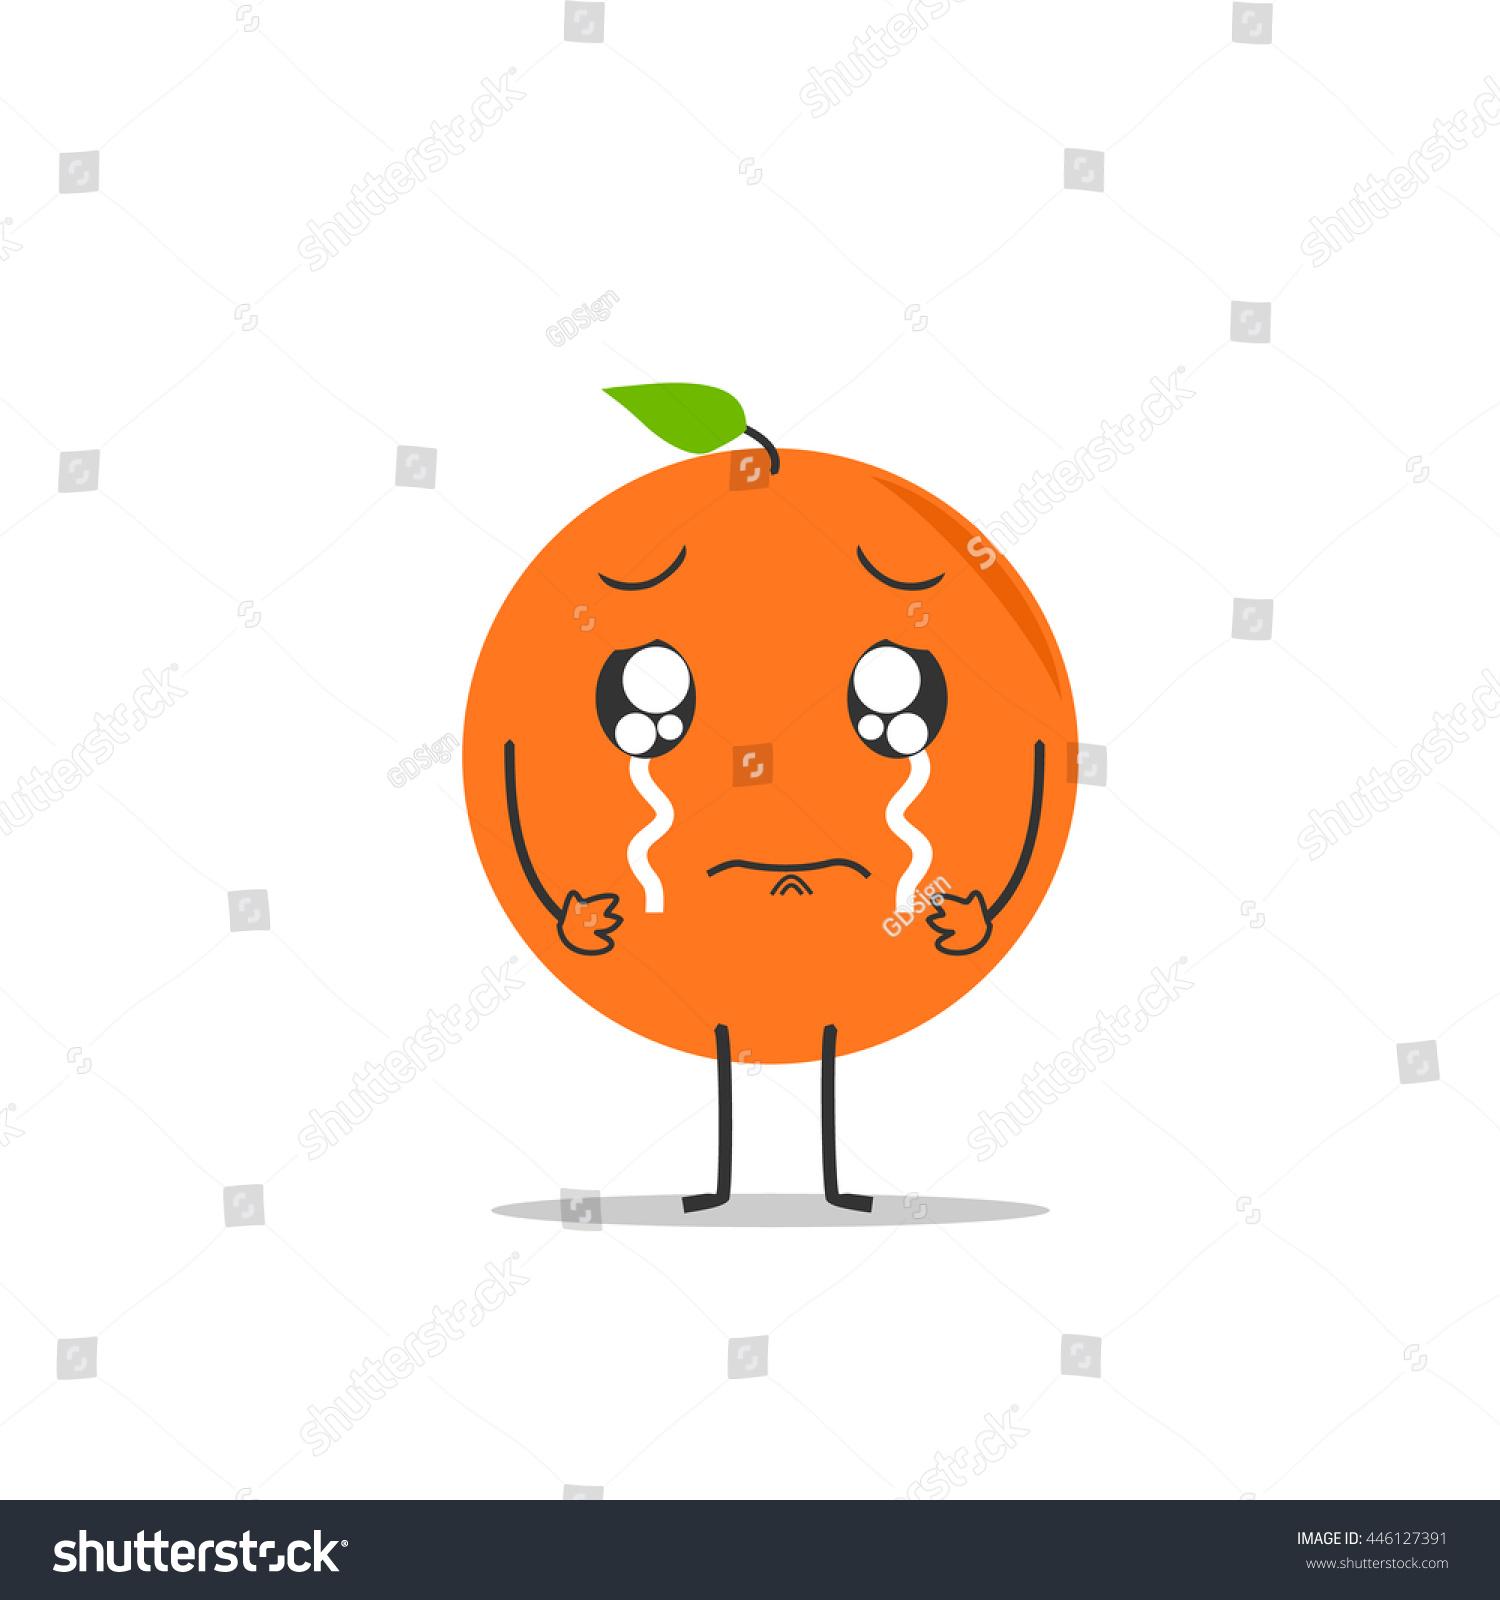 crying orange simple clean cartoon illustration stock vector crying orange simple clean cartoon illustration